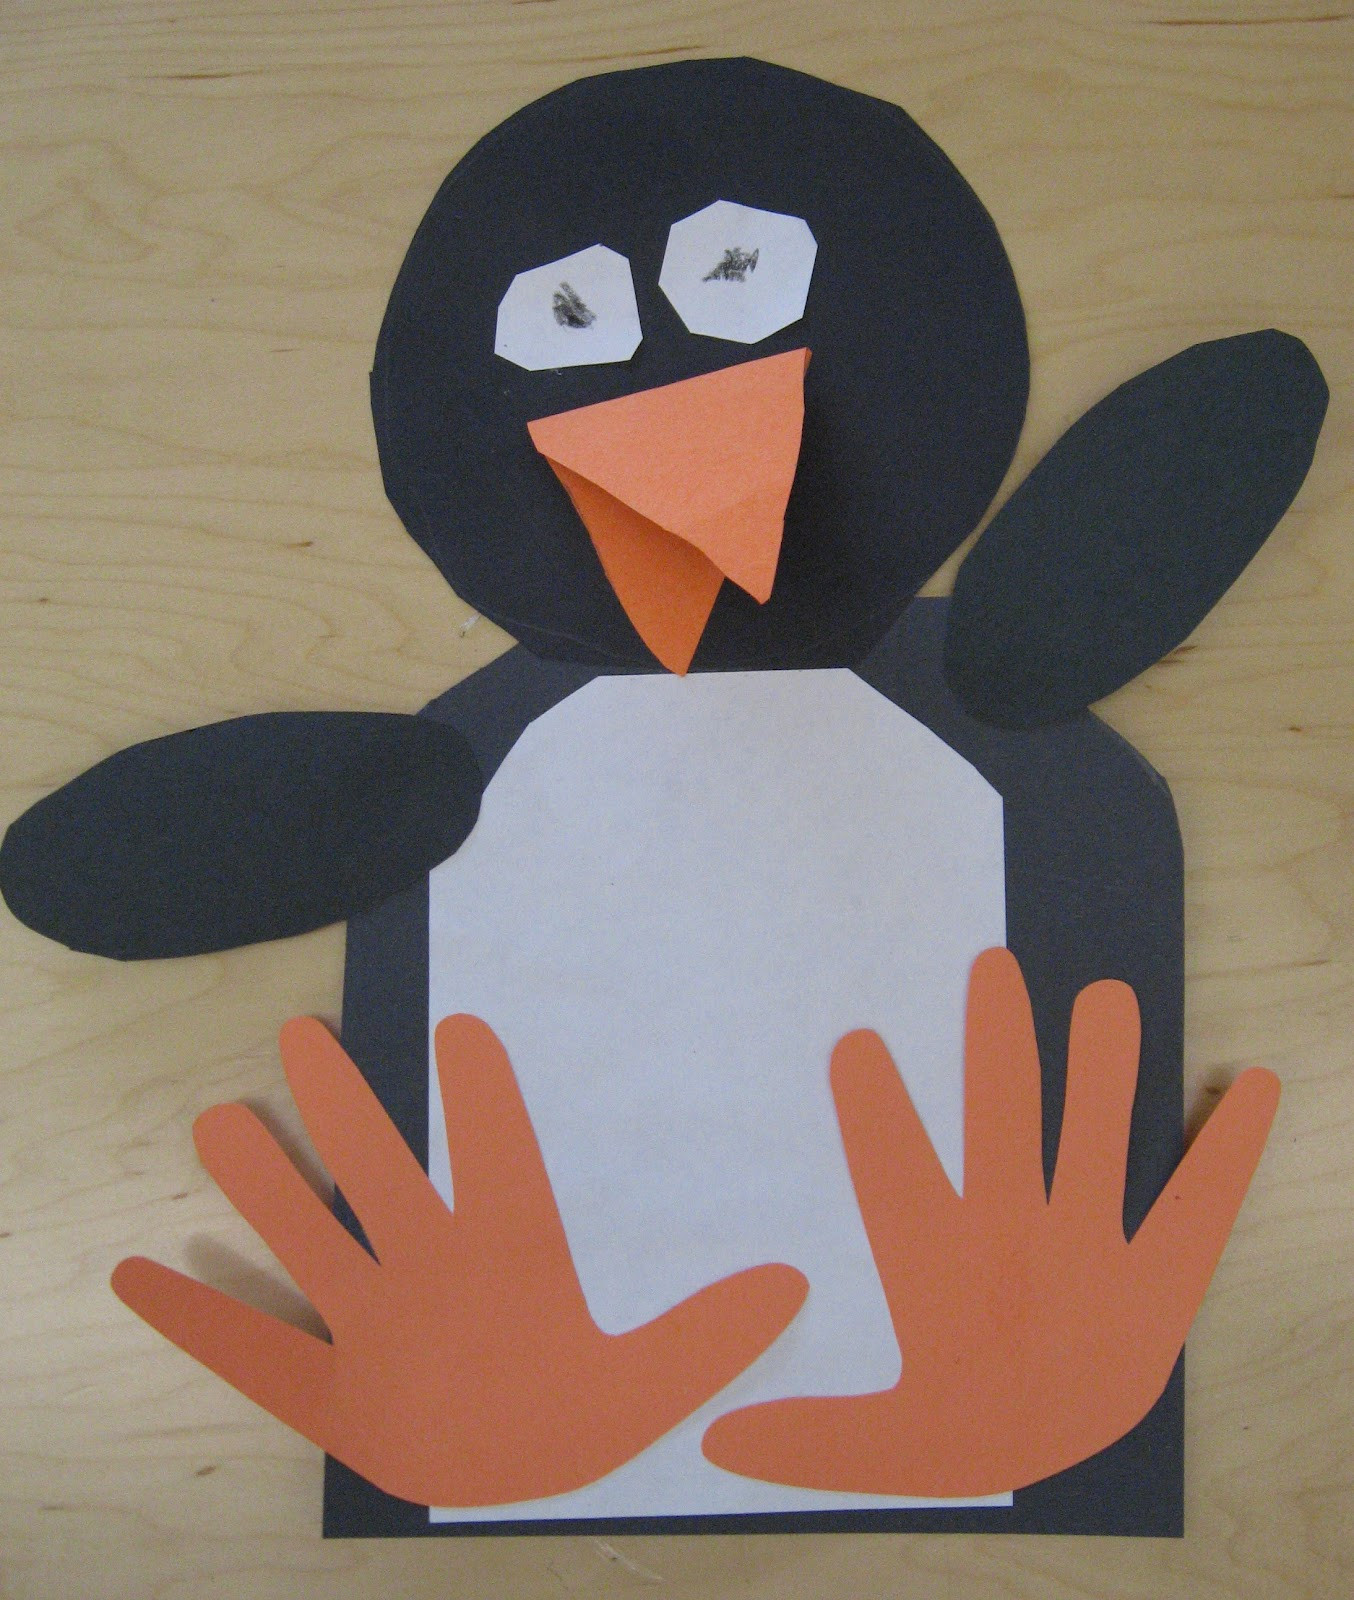 Penguin Craft For Preschoolers  handprint penguins rubber boots and elf shoes